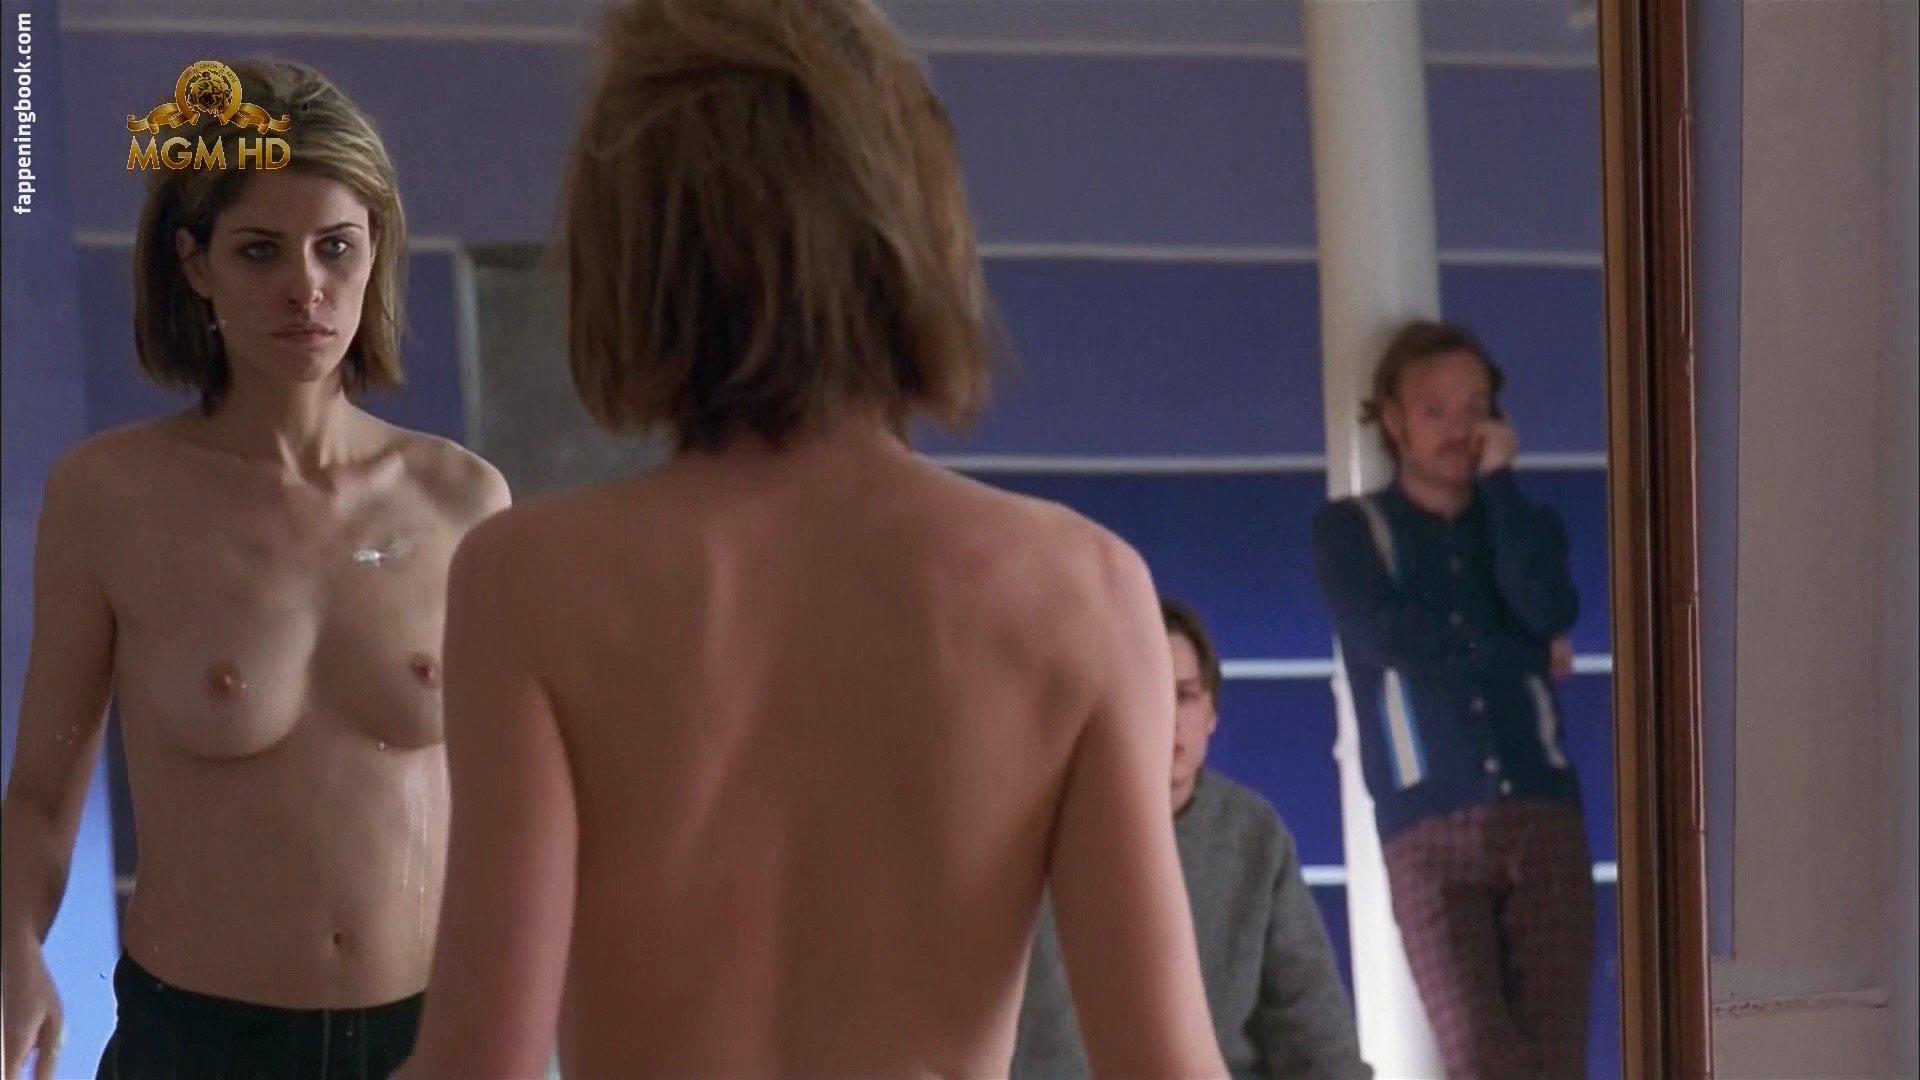 Amanda Peet Nude amanda peet nude, sexy, the fappening, uncensored - photo